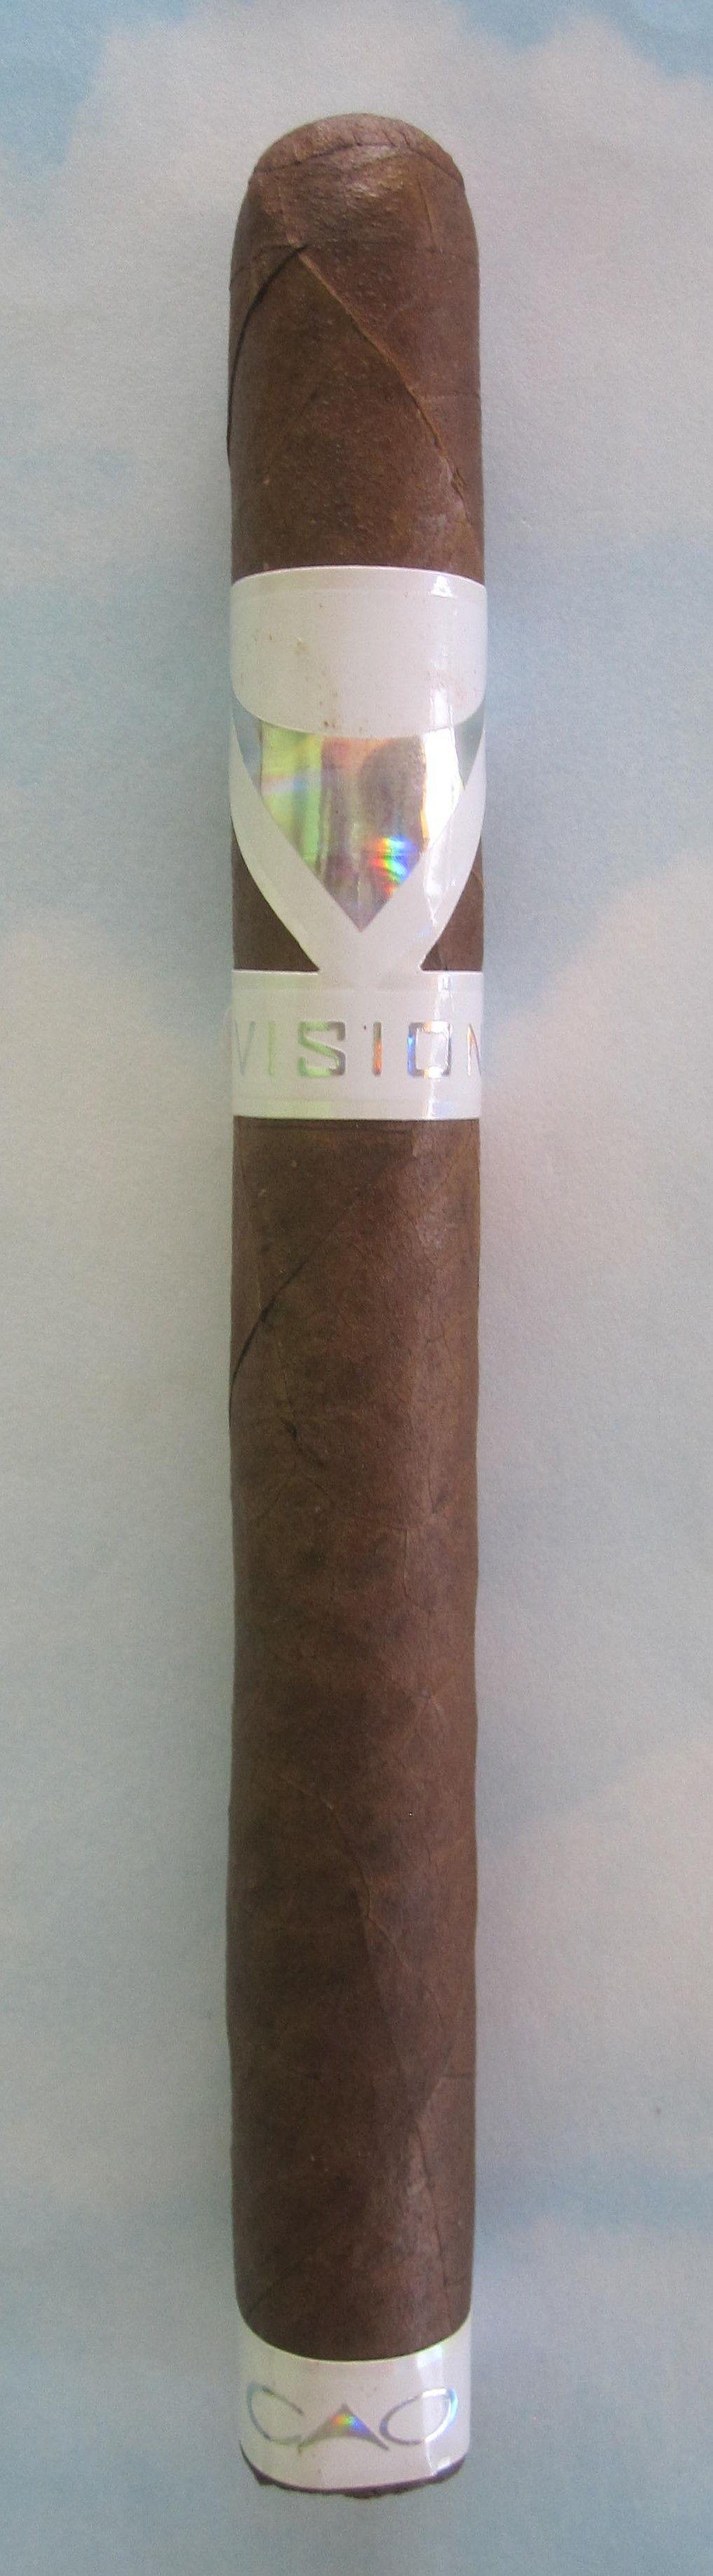 CAO Vision Cigar